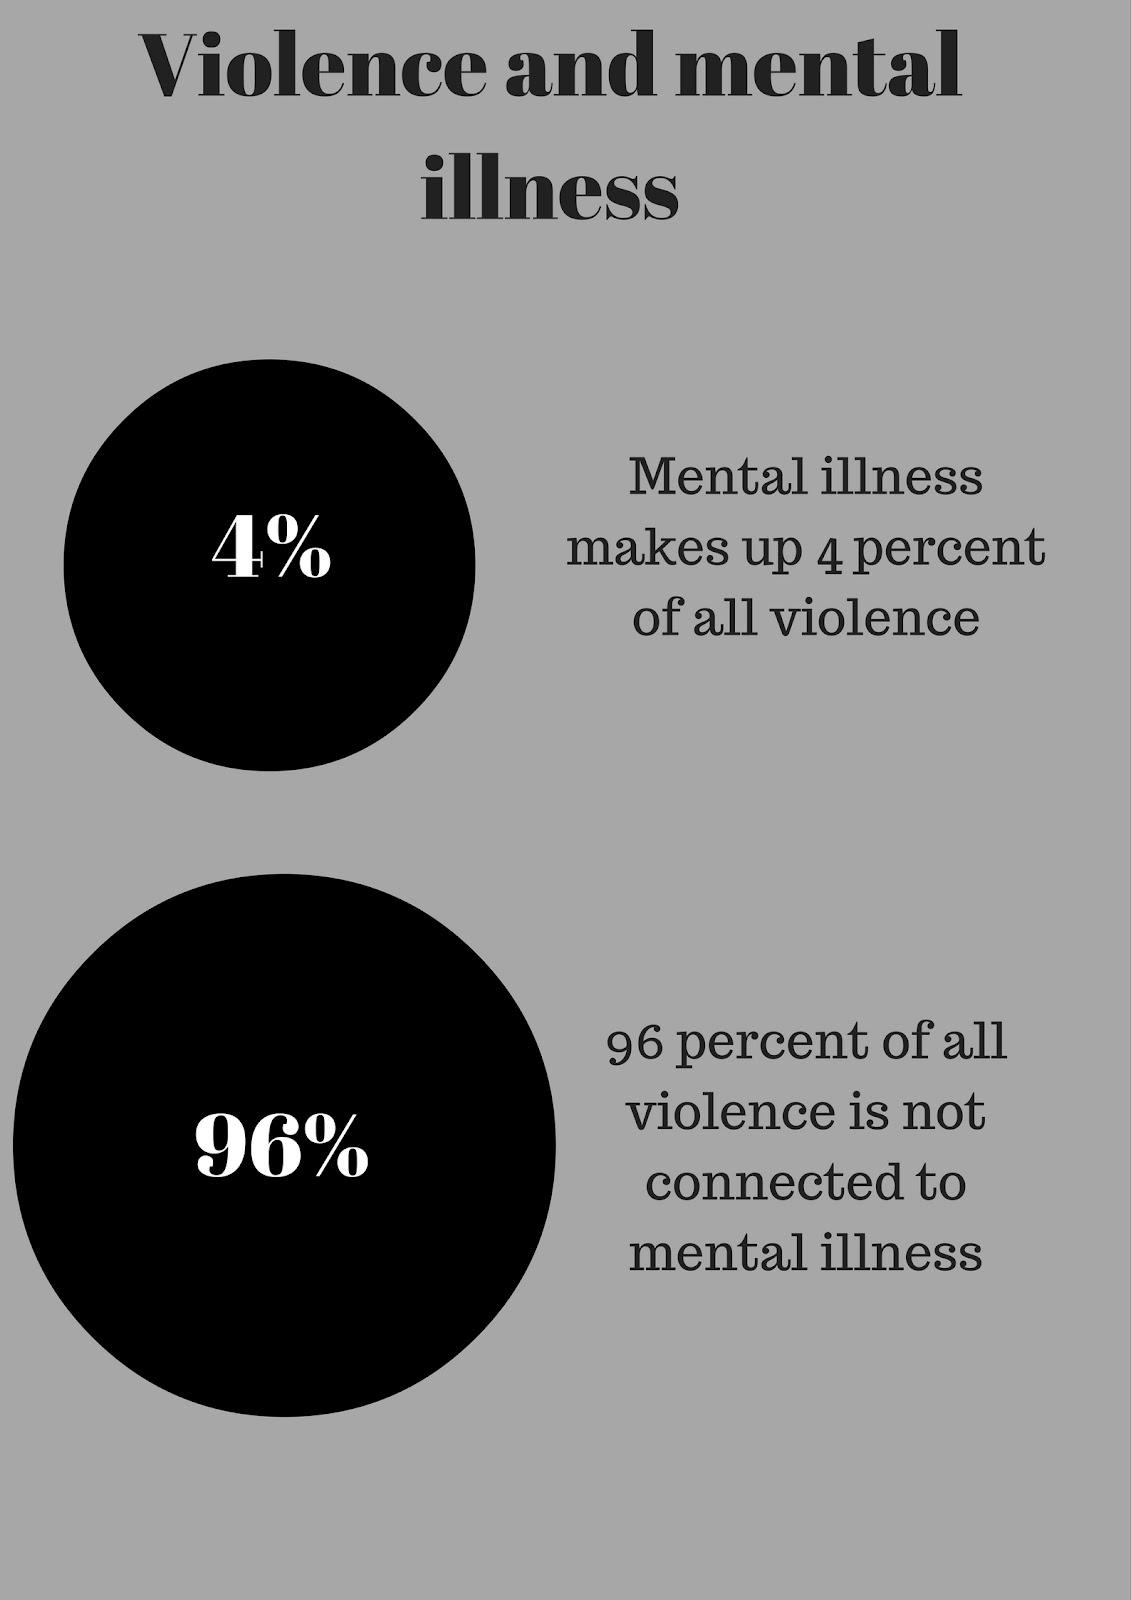 Image result for misconception gun violence mental illness graph